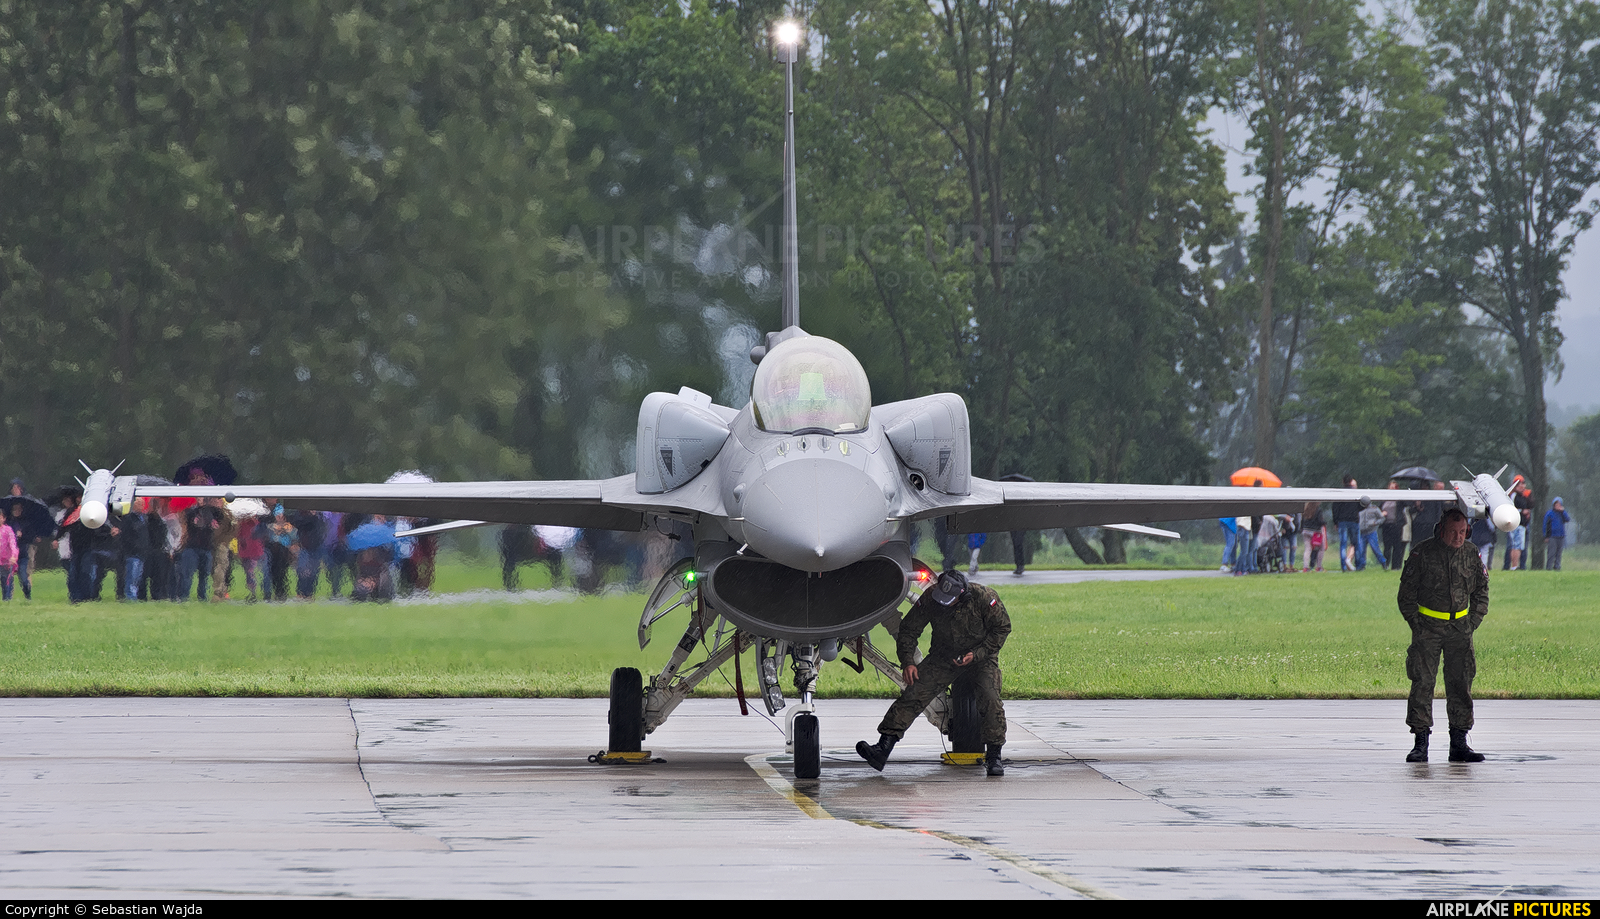 Poland - Air Force 4047 aircraft at Świdwin